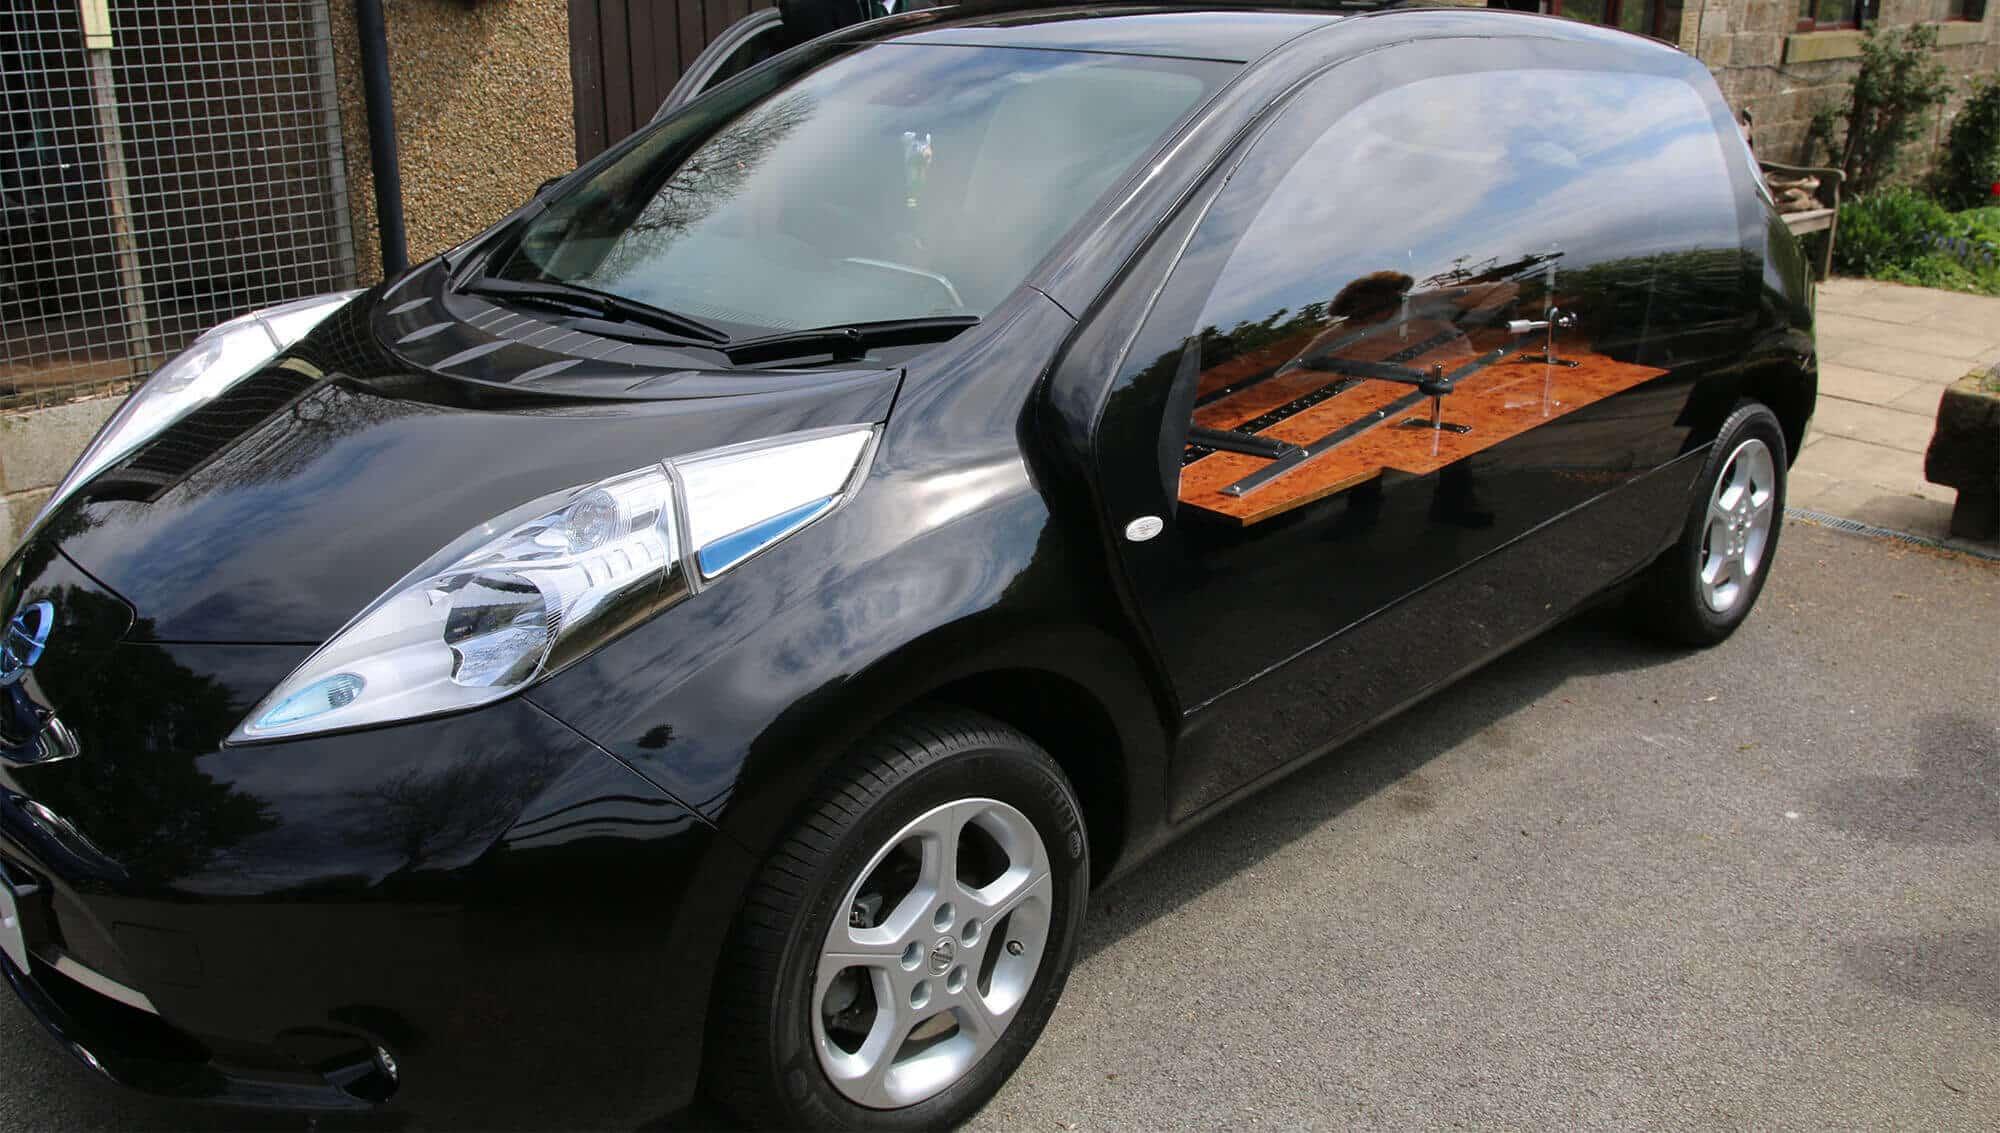 Eco hearse